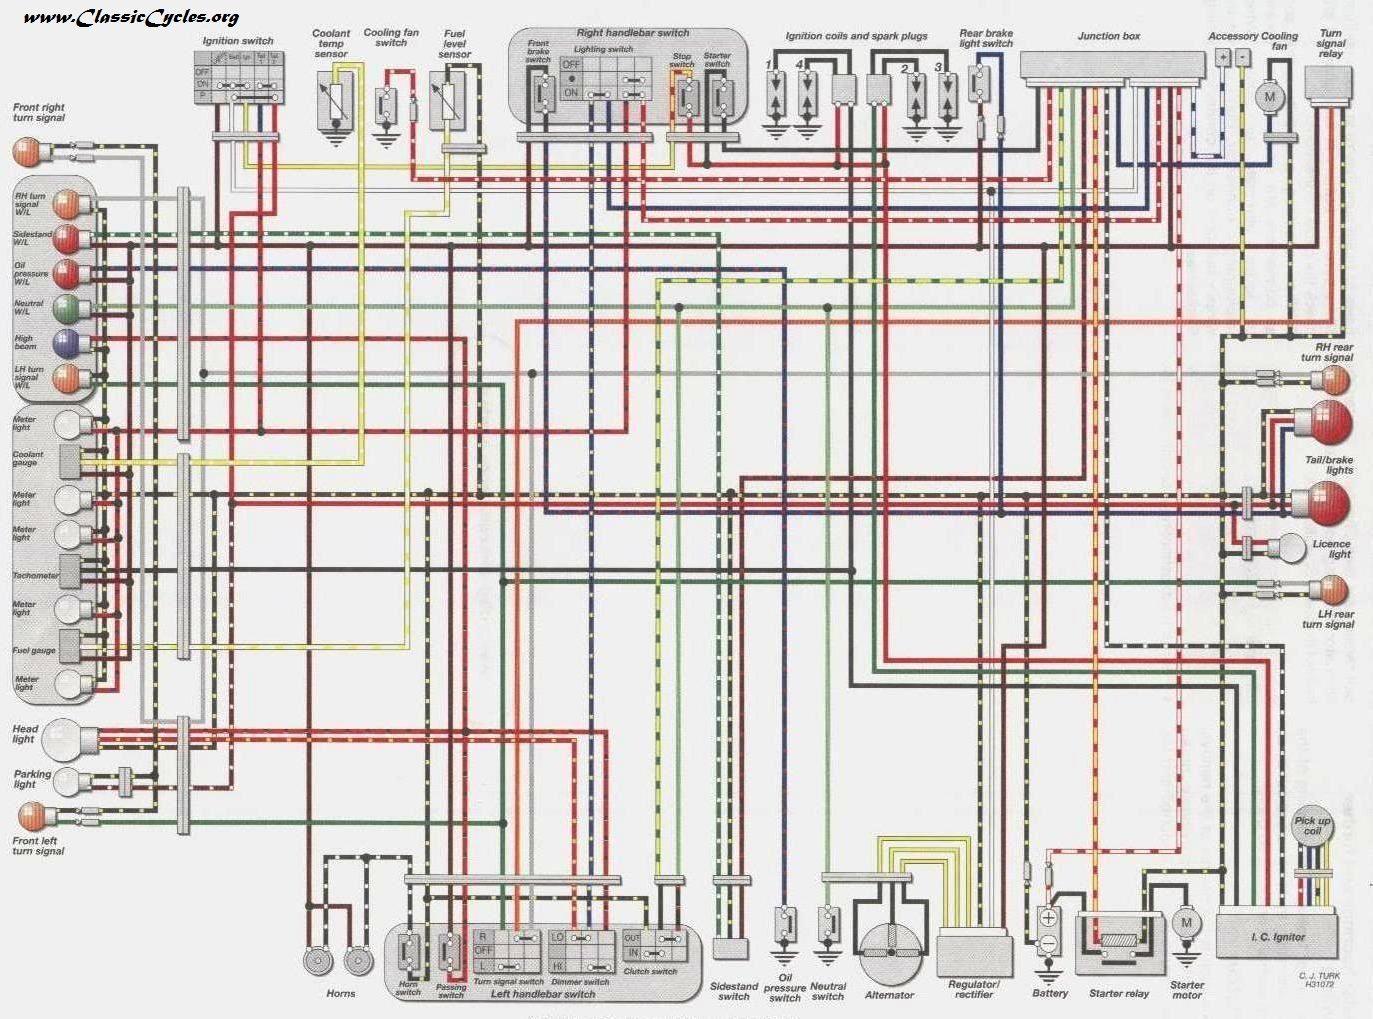 Wiring Diagram Kawasaki Ninja 250 Fi Circuit Diagram Images Kawasaki Ninja Kawasaki Diagram